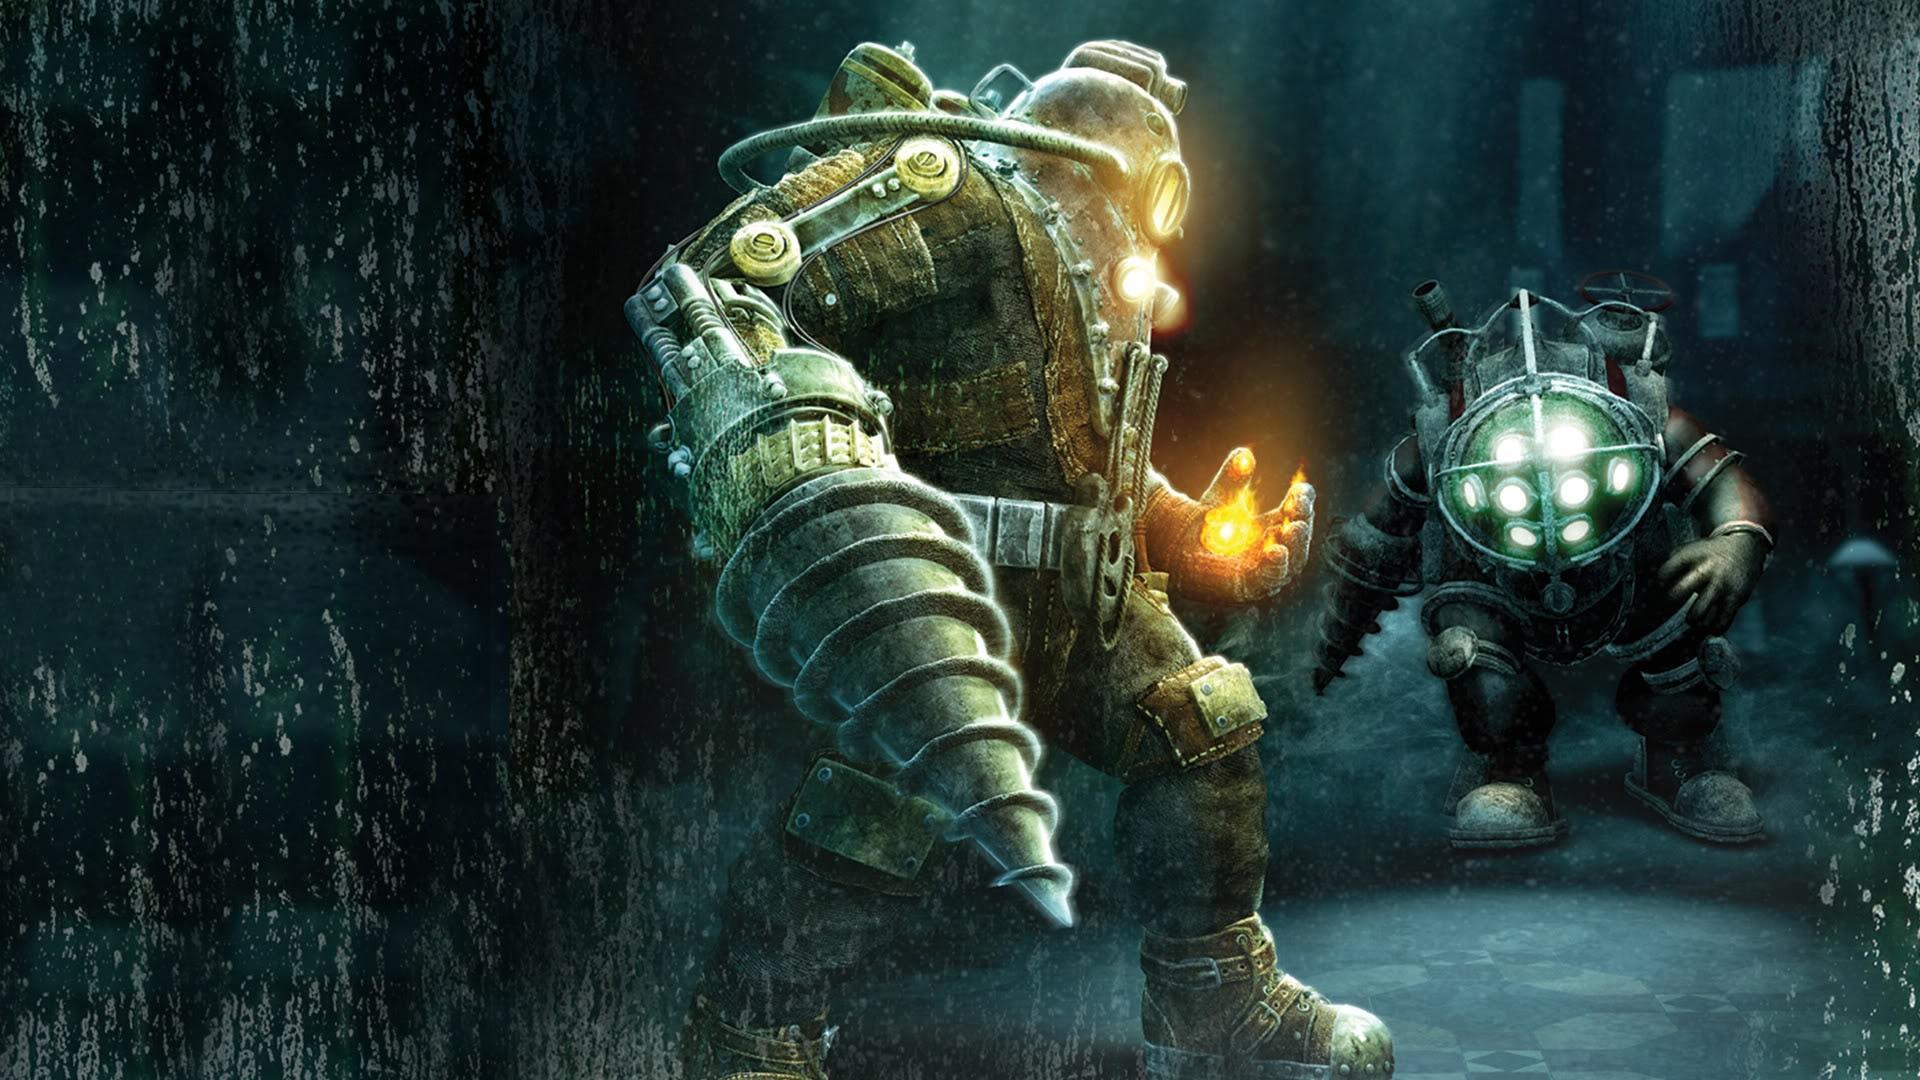 Wallpaper Big Daddy Bioshock Mythology Screenshot